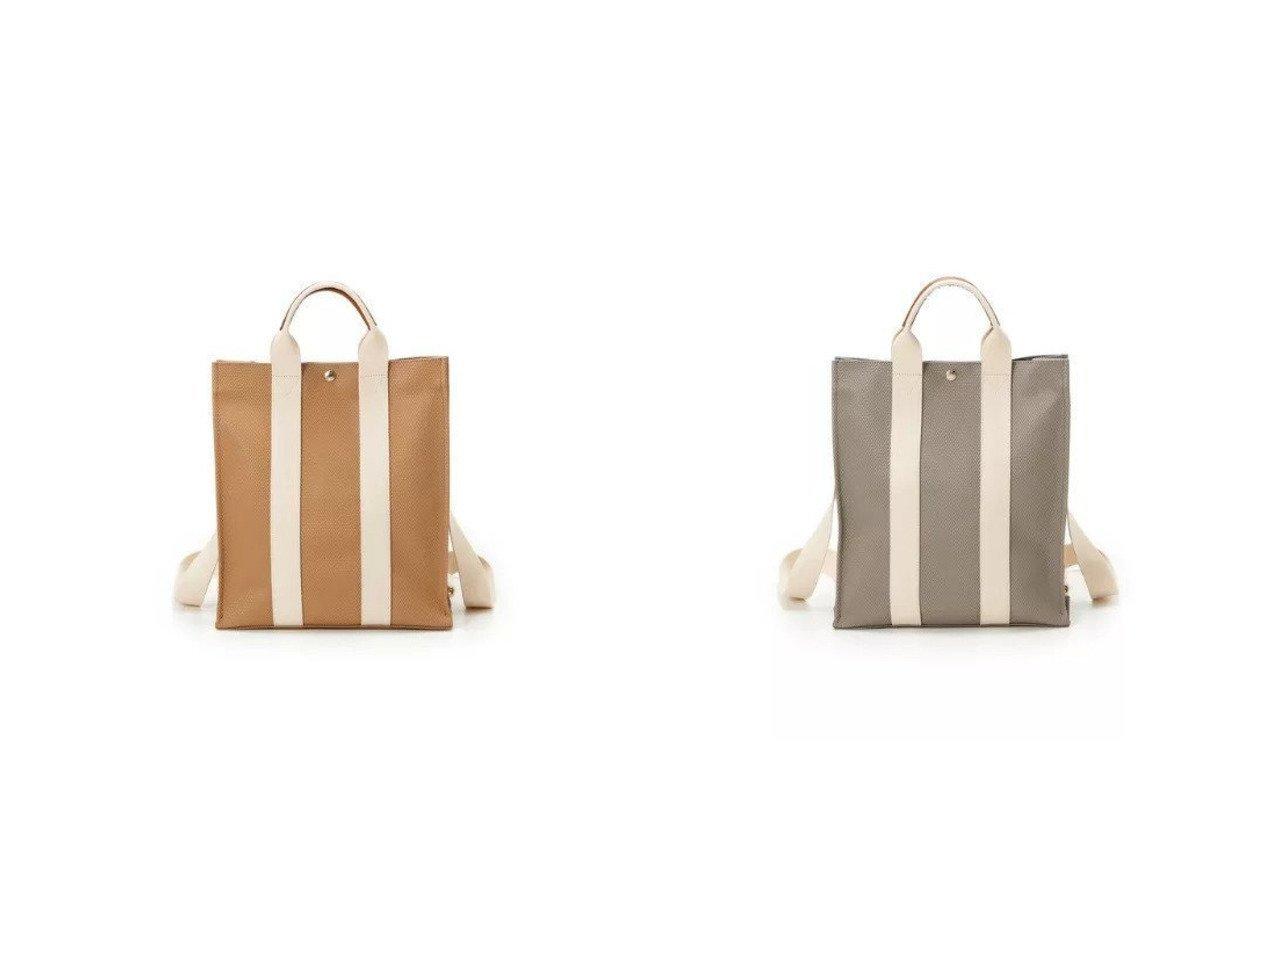 【TOPKAPI/トプカピ】の[トプカピ ブレス] TOPKAPI BREATH オリジナルPVC A4 縦型 バックパック RHOMBUS ランバス 【バッグ・鞄】おすすめ!人気、トレンド・レディースファッションの通販 おすすめで人気の流行・トレンド、ファッションの通販商品 インテリア・家具・メンズファッション・キッズファッション・レディースファッション・服の通販 founy(ファニー) https://founy.com/ ファッション Fashion レディースファッション WOMEN バッグ Bag スクエア フォルム 日本製 Made in Japan |ID:crp329100000043333